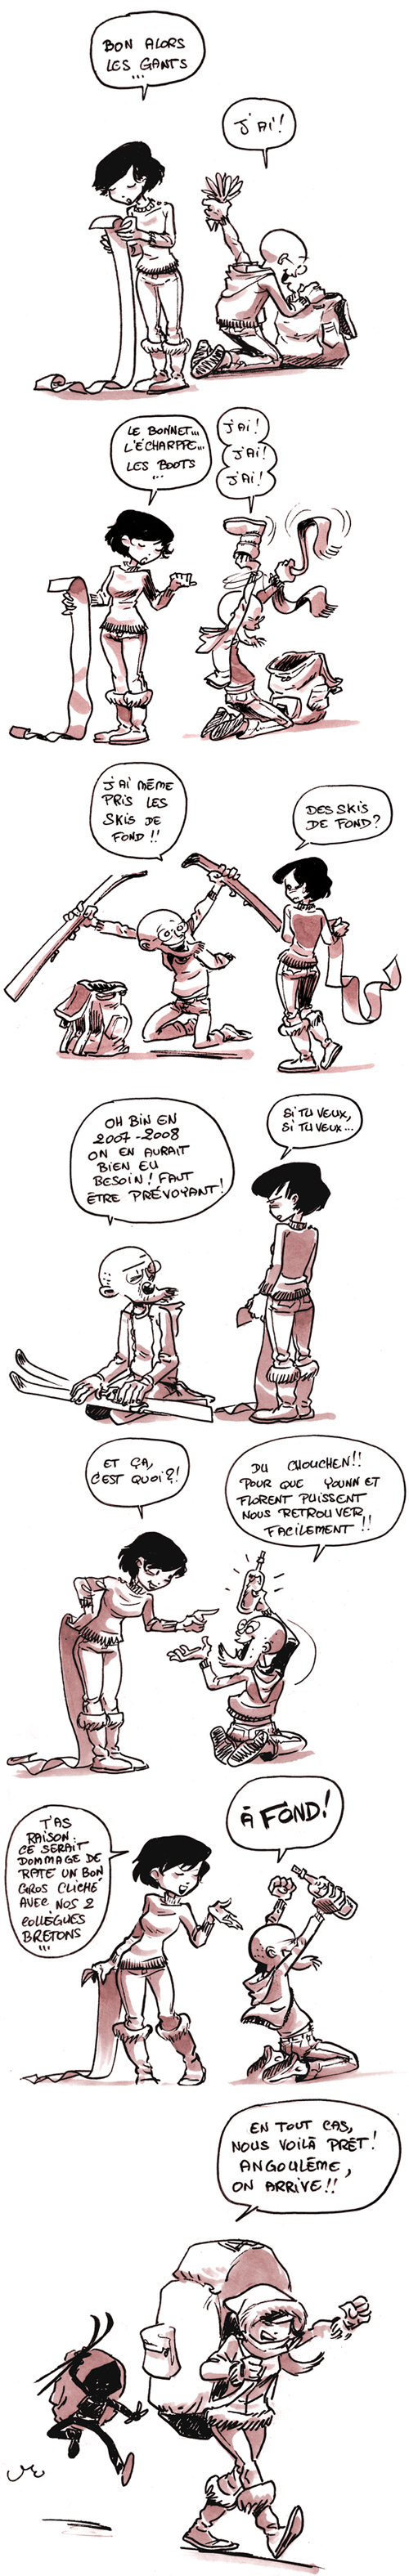 Angouleme-2014-01.jpg